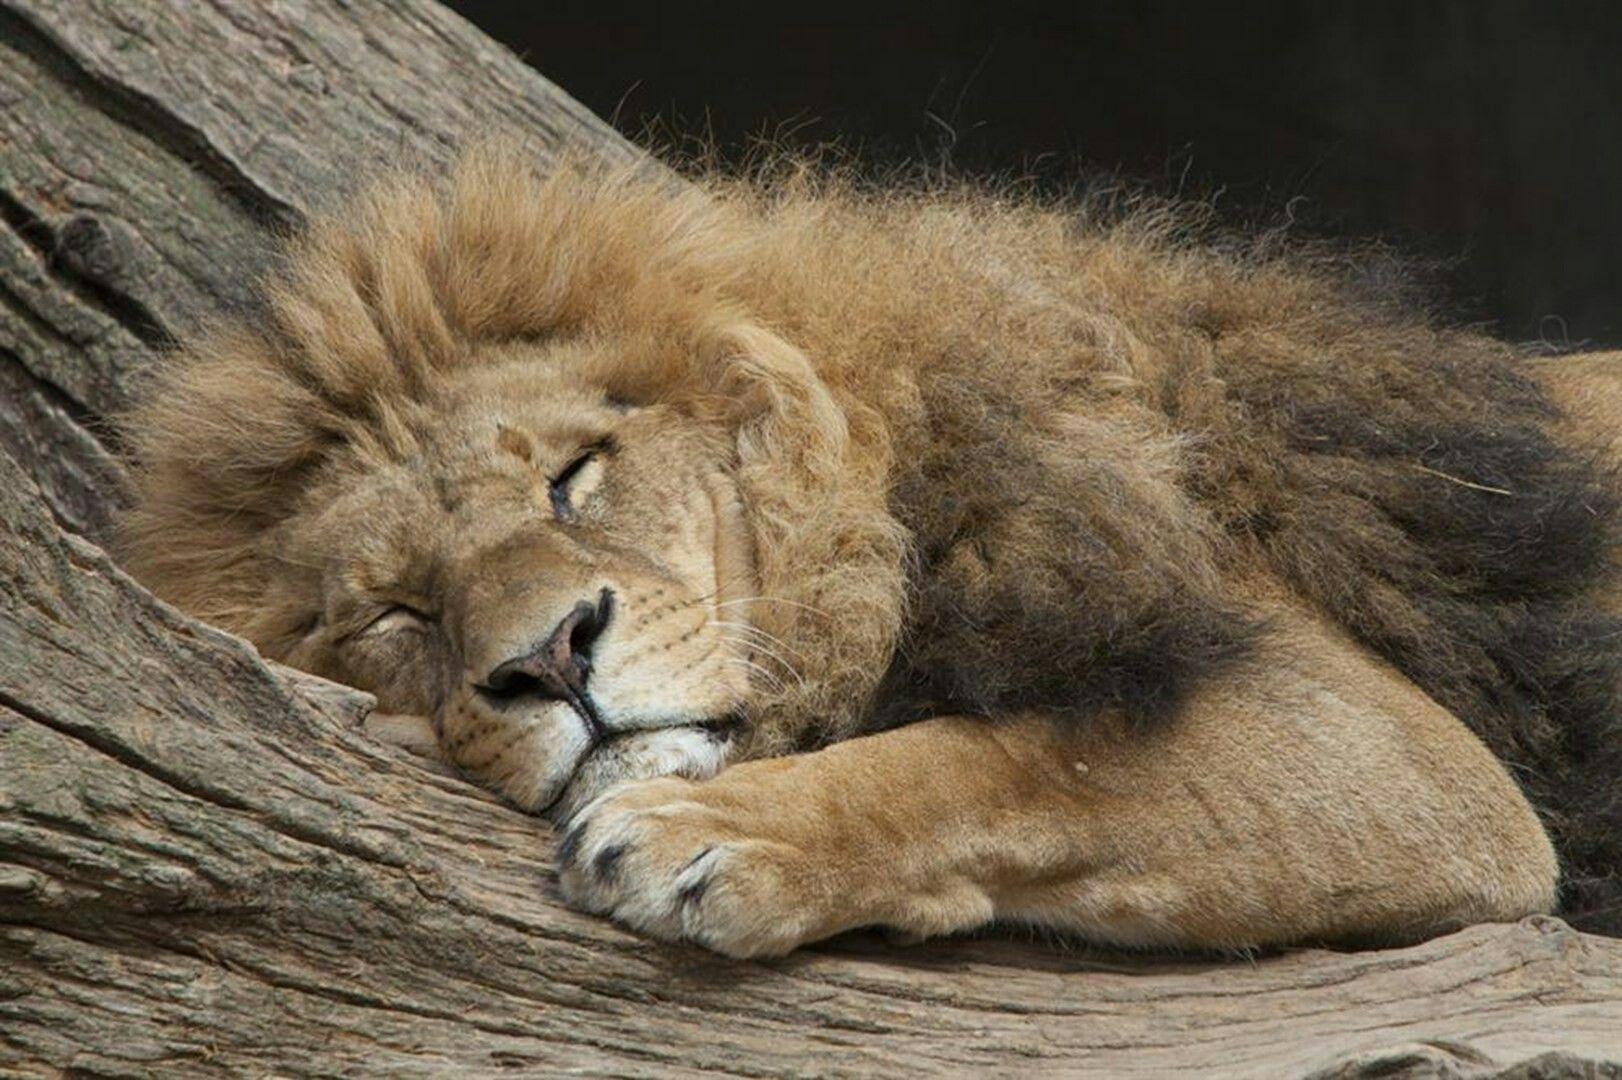 Lion Sleeping With Images Sleeping Animals Sleeping Lion Lion